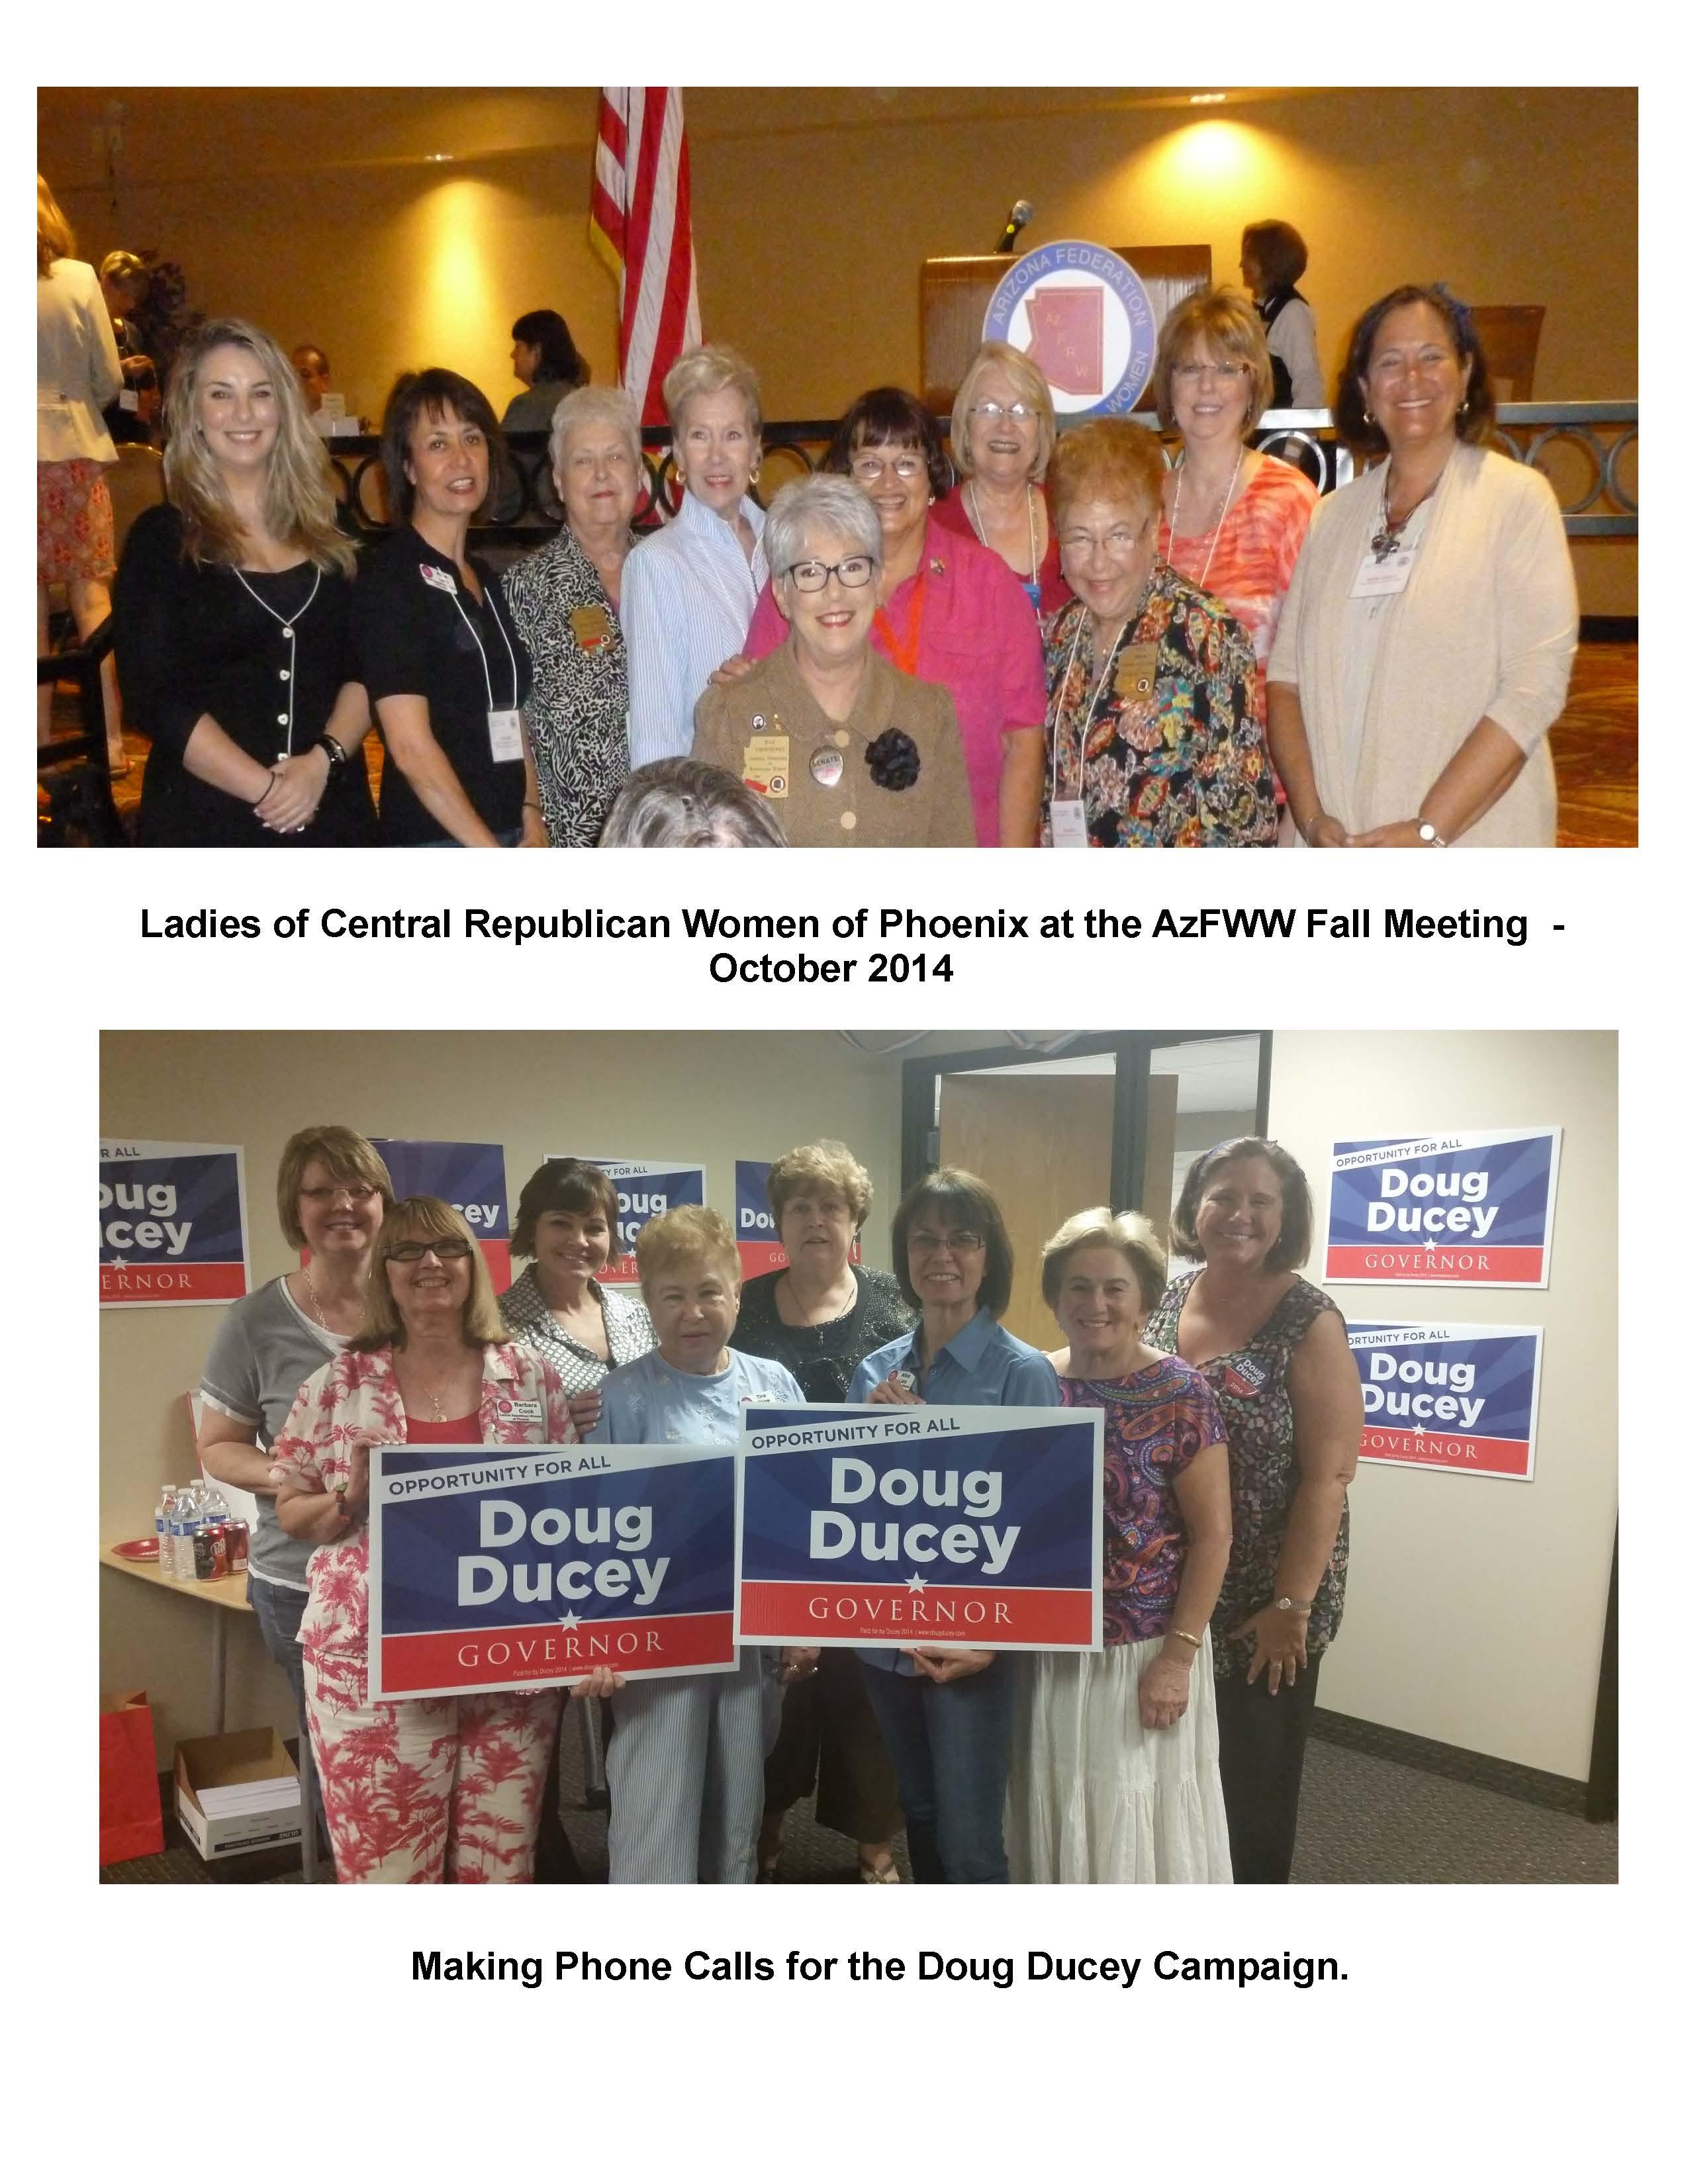 Pics for AzFRW-Greater Phoenix Republican Women_Page_1